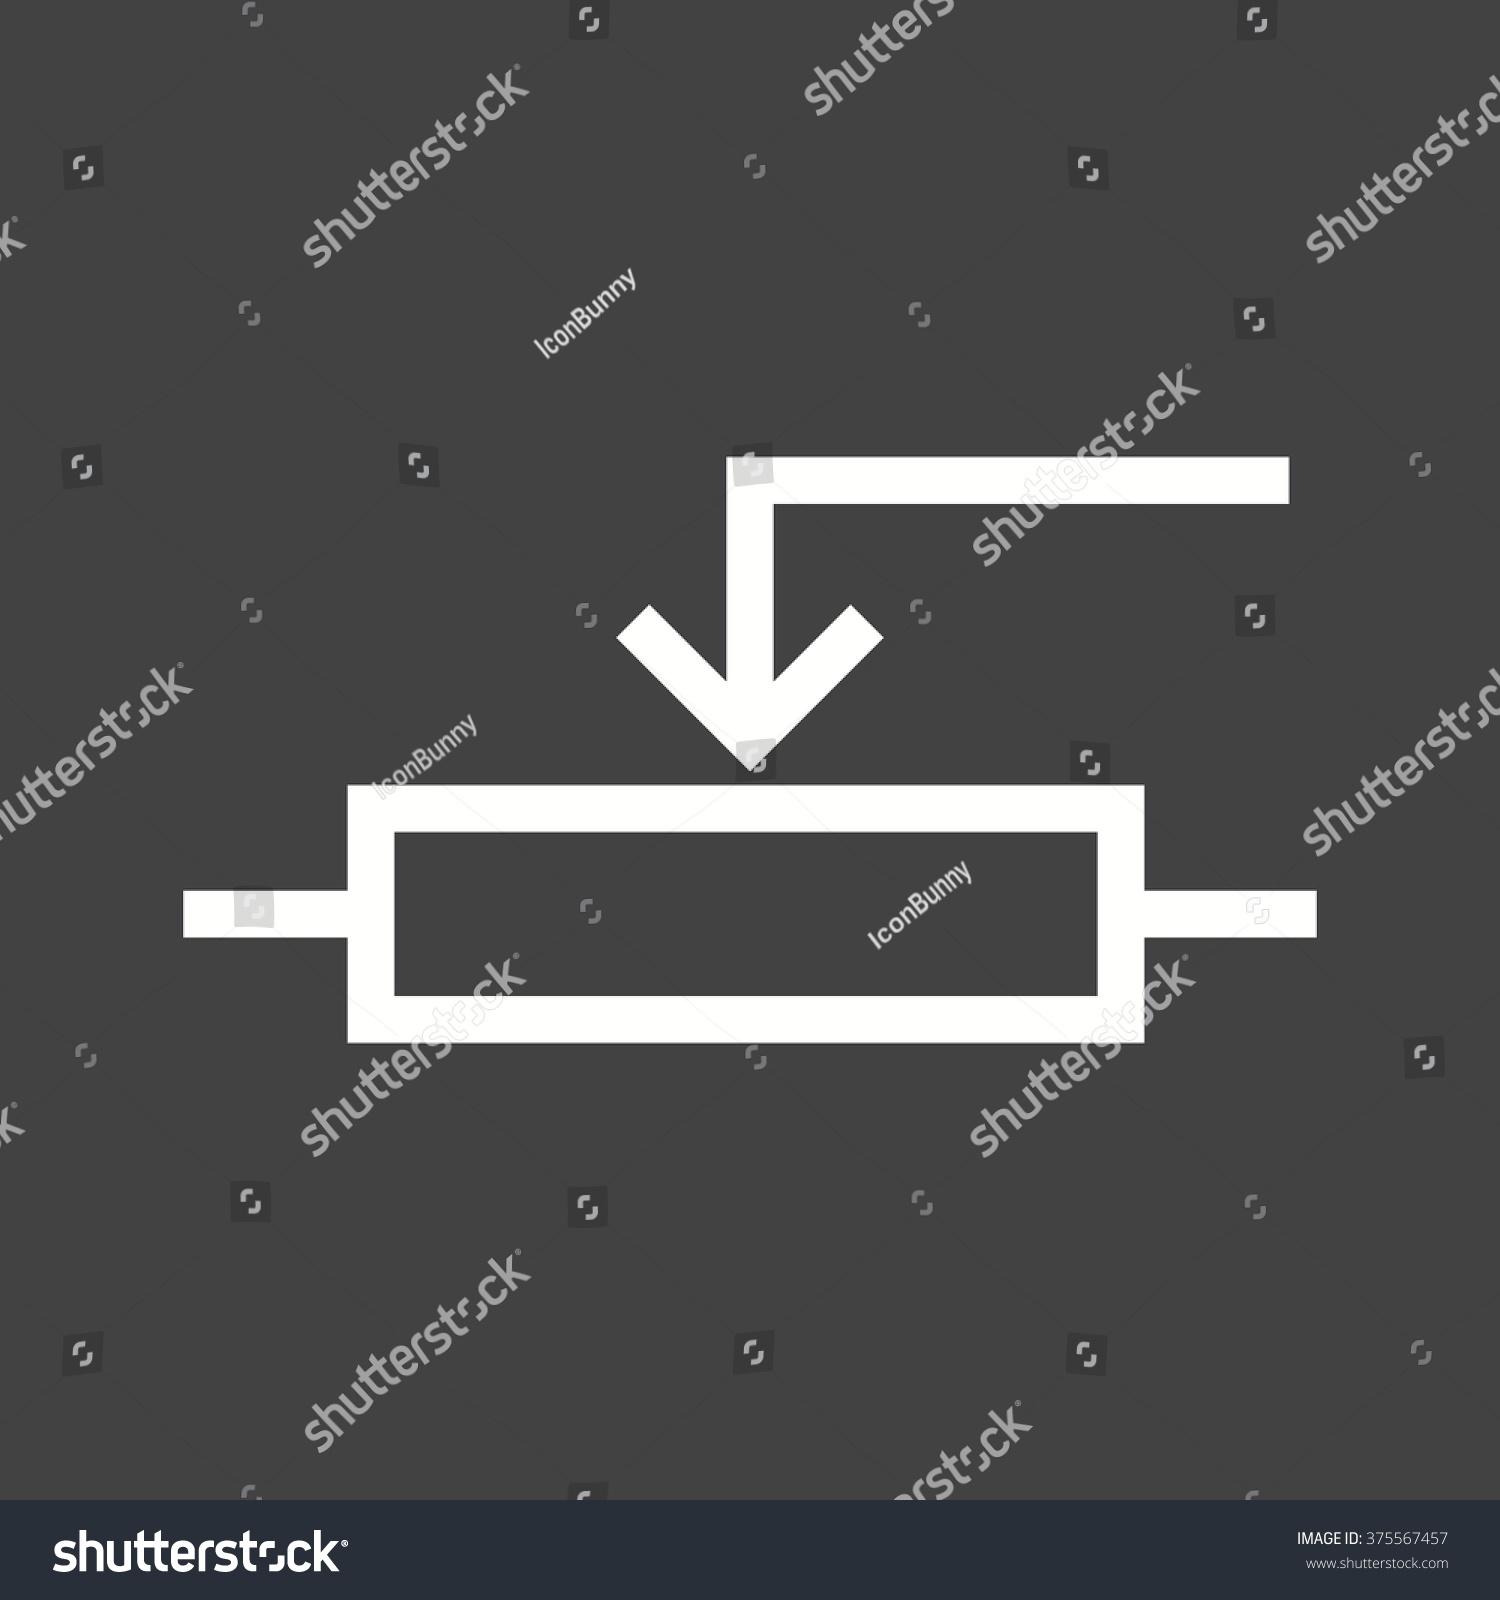 Potentiometer Stock Vector 375567457 - Shutterstock